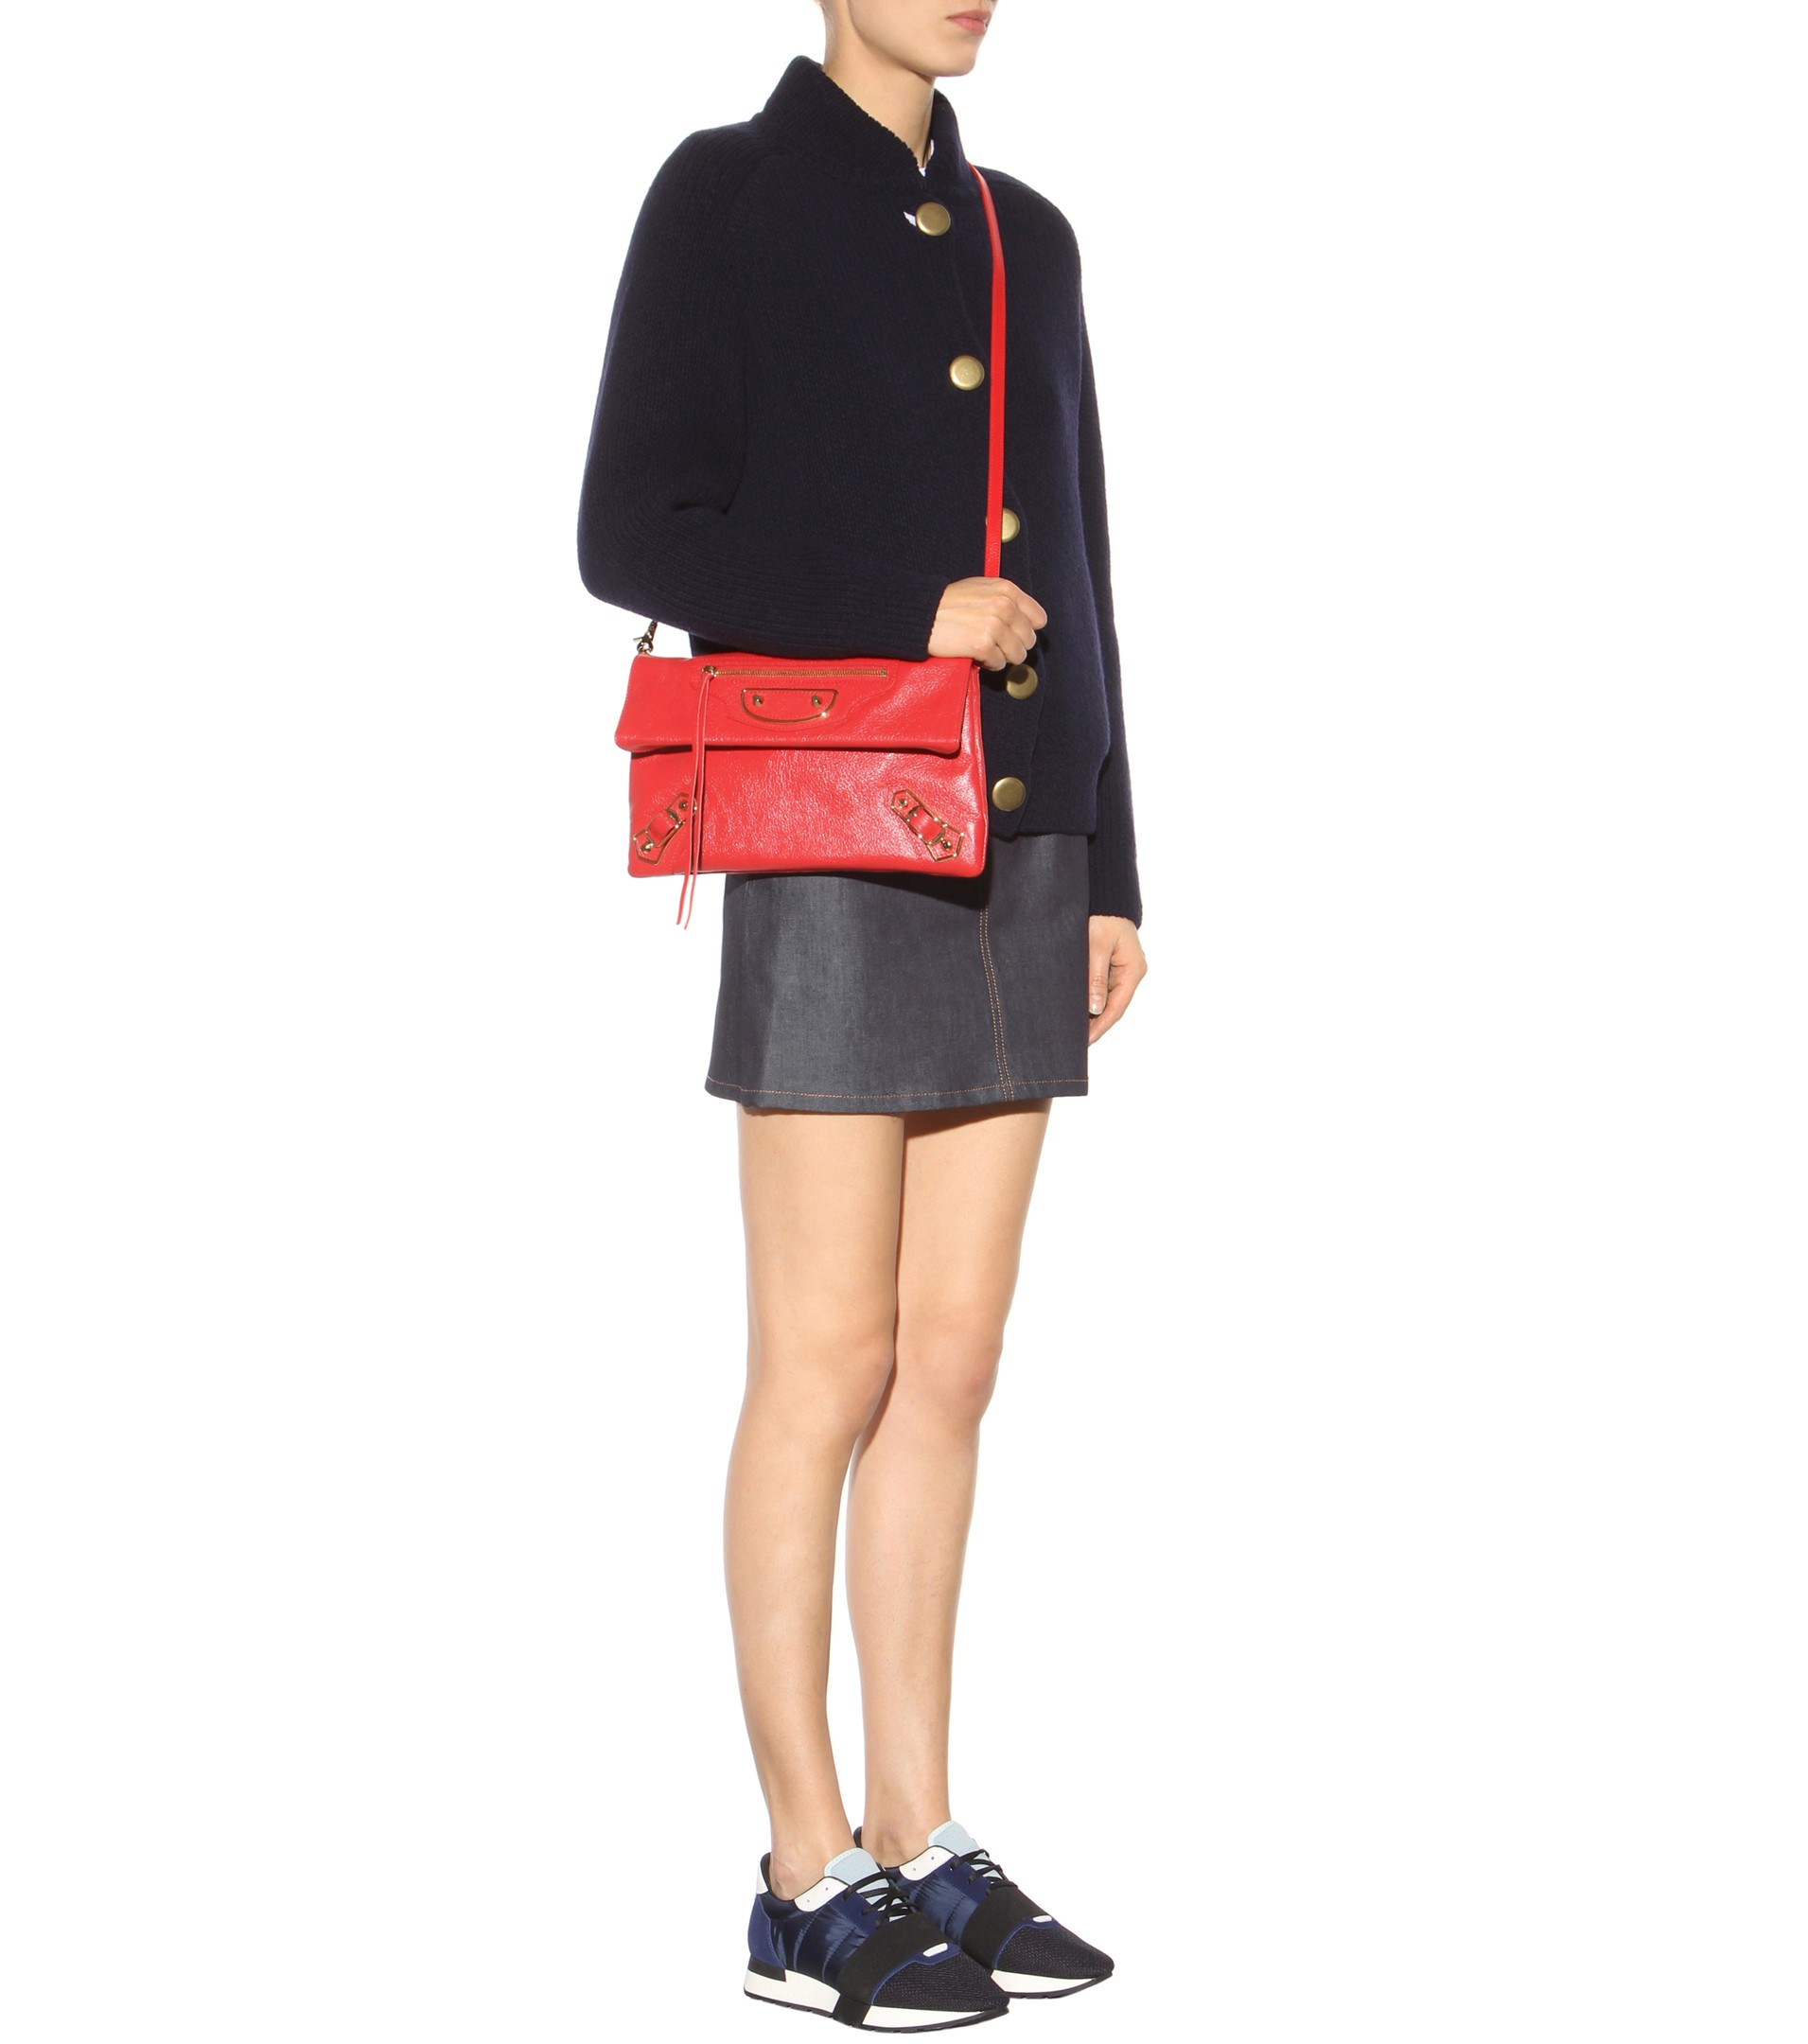 d91fe06841 Balenciaga Classic Metallic Edge Envelope Leather Shoulder Bag in ...